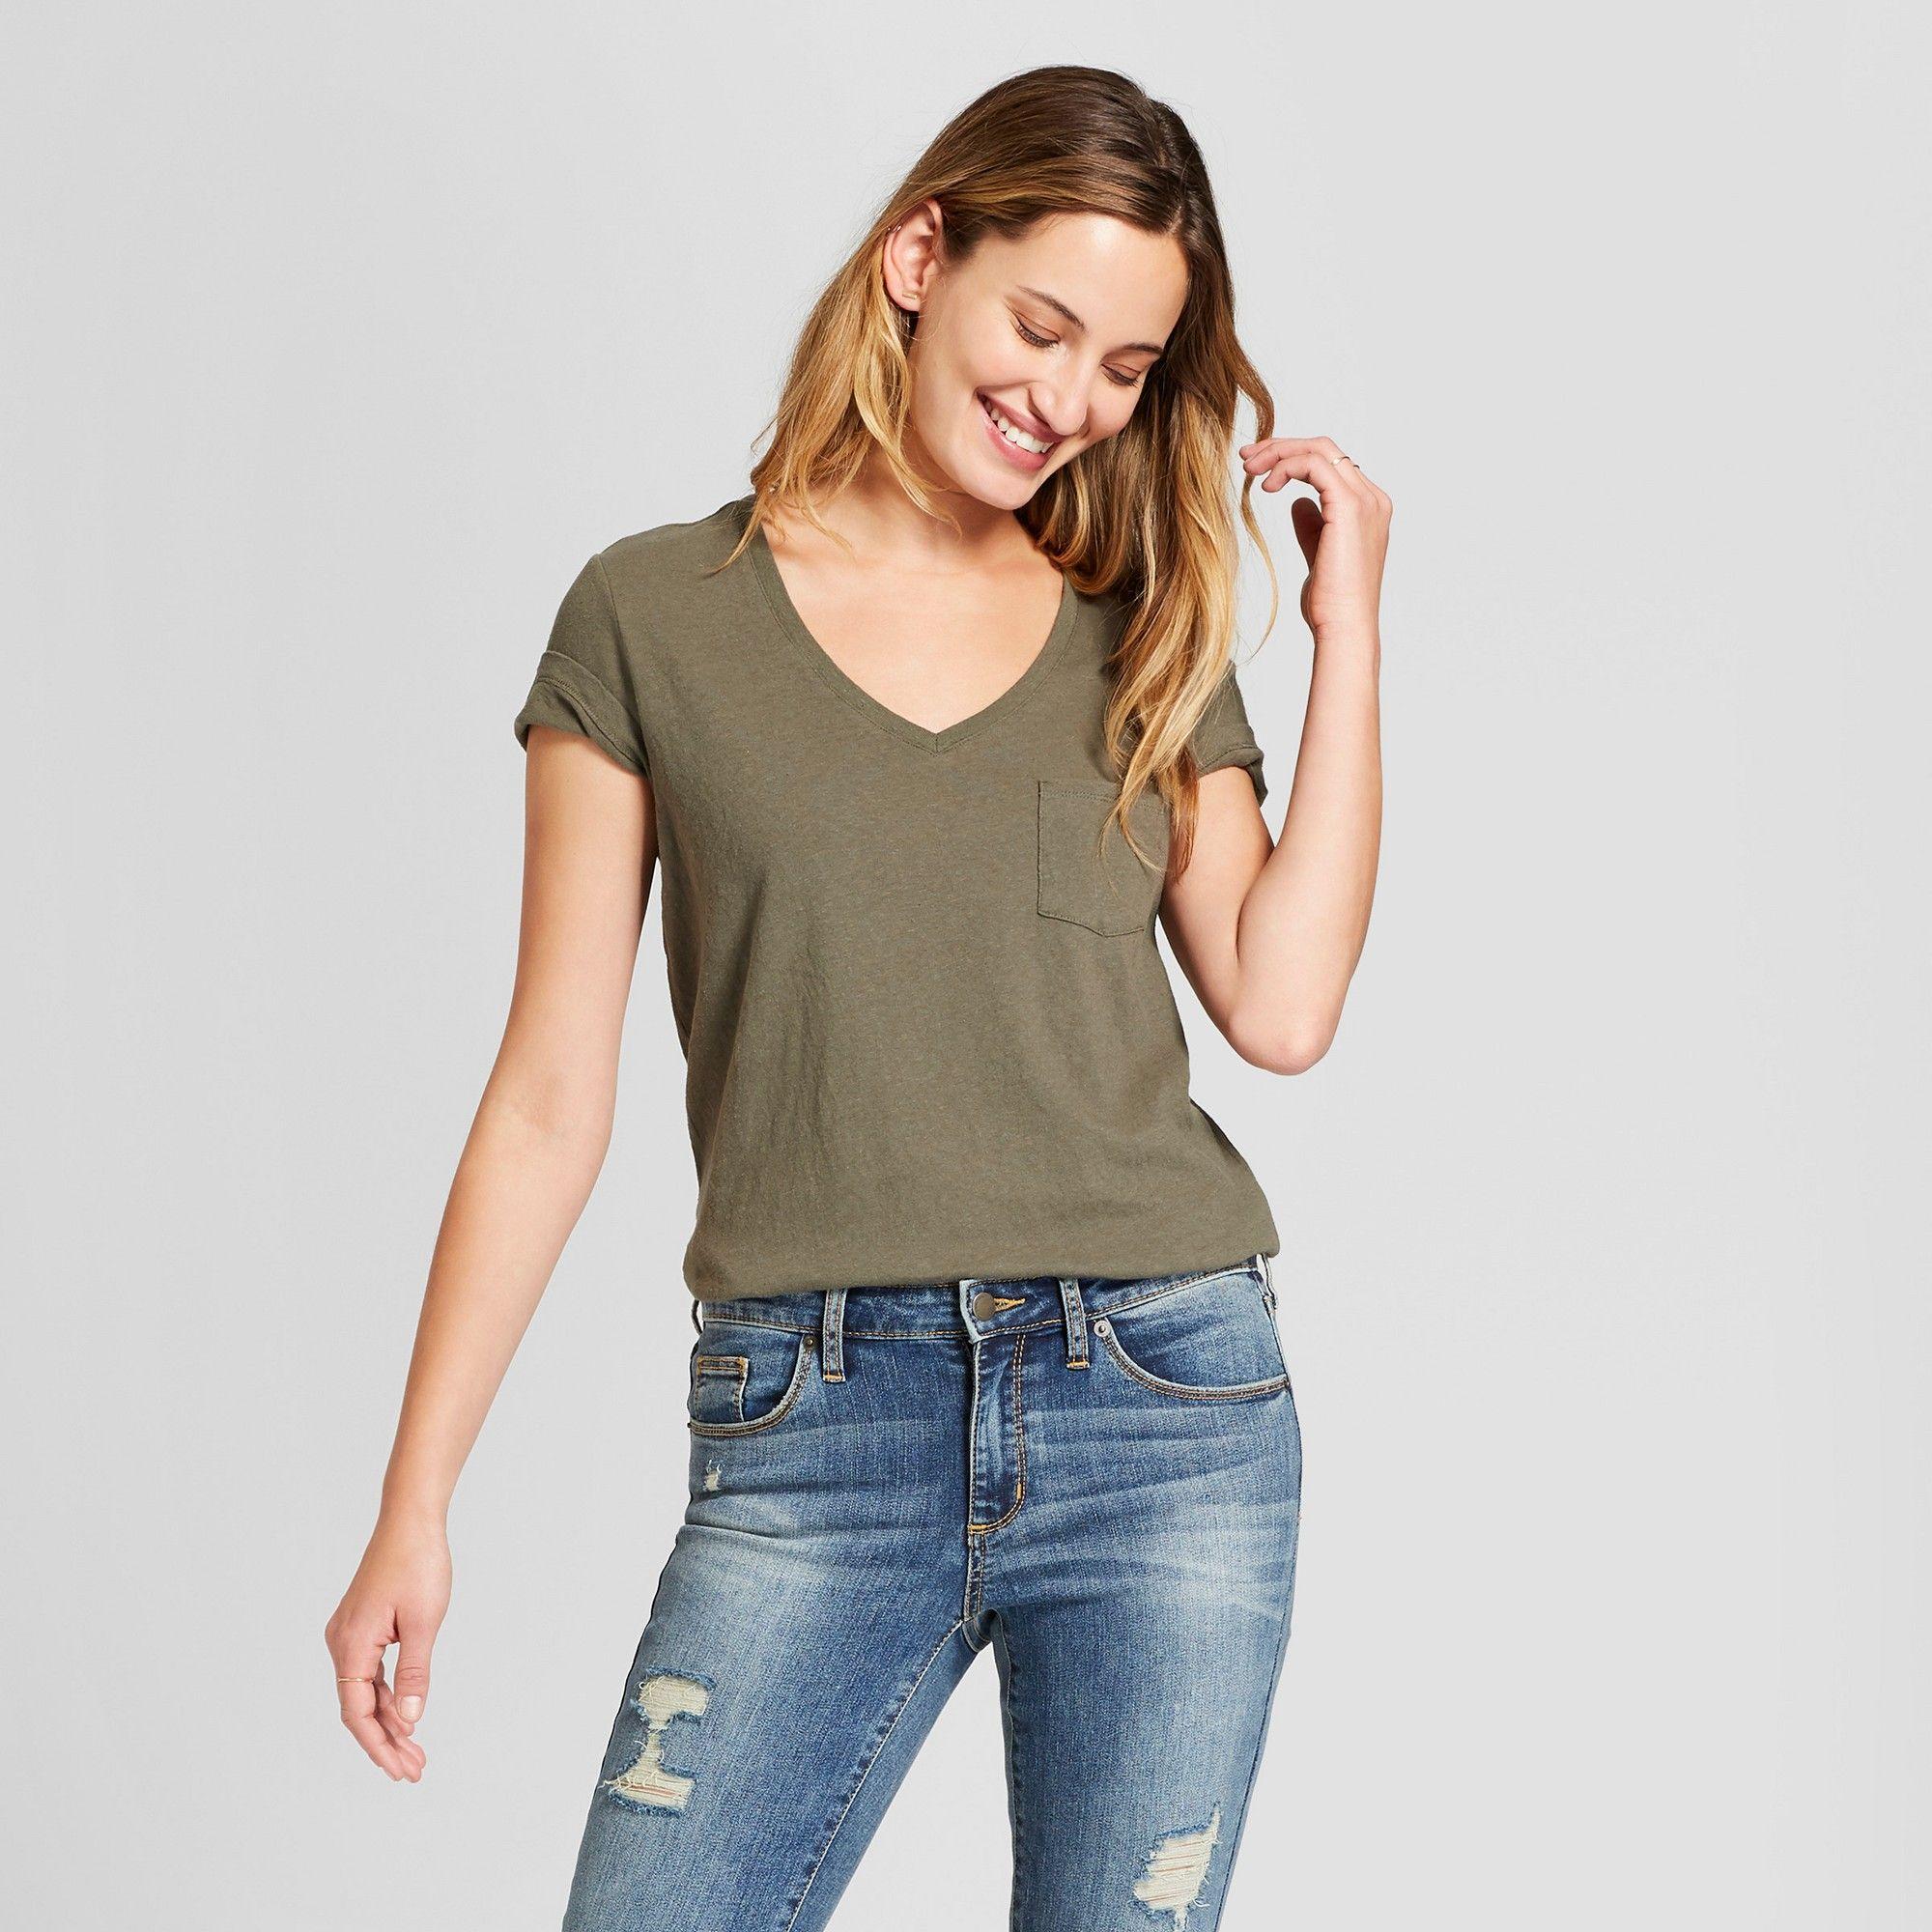 844db86ceac51b Women's Monterey Pocket V-Neck Short Sleeve T-Shirt - Universal Thread  Olive (Green) L